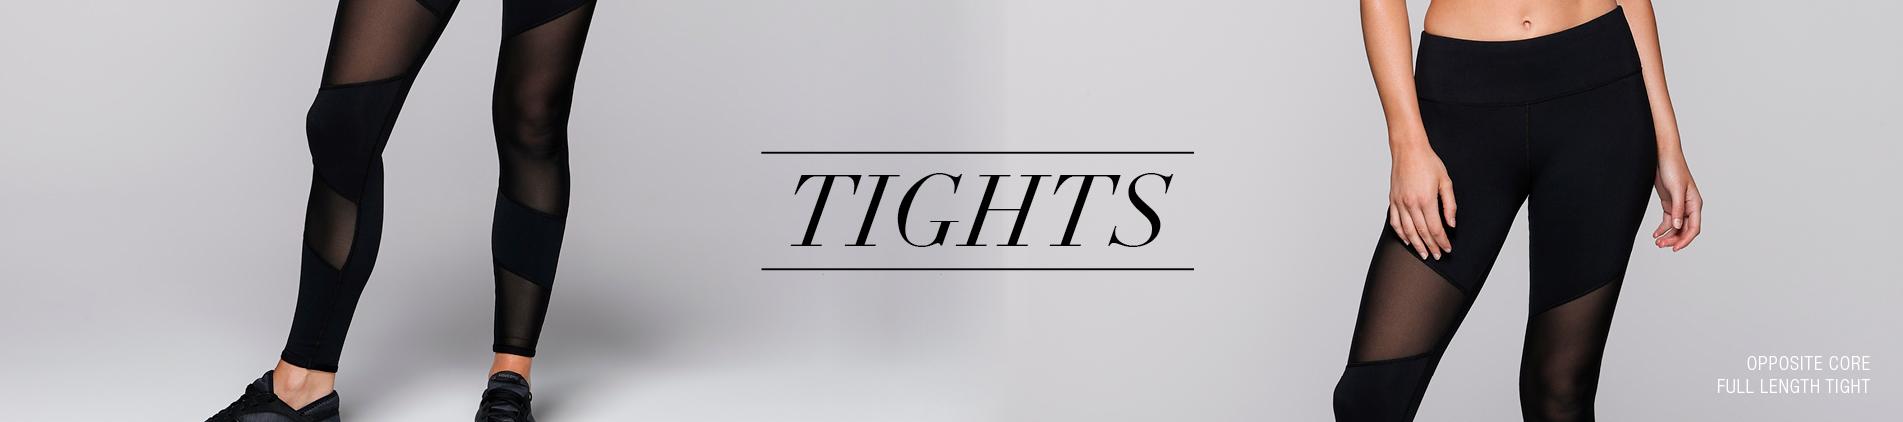 lornajane-activewear-tights-desktop-opposite-core-fl-tight